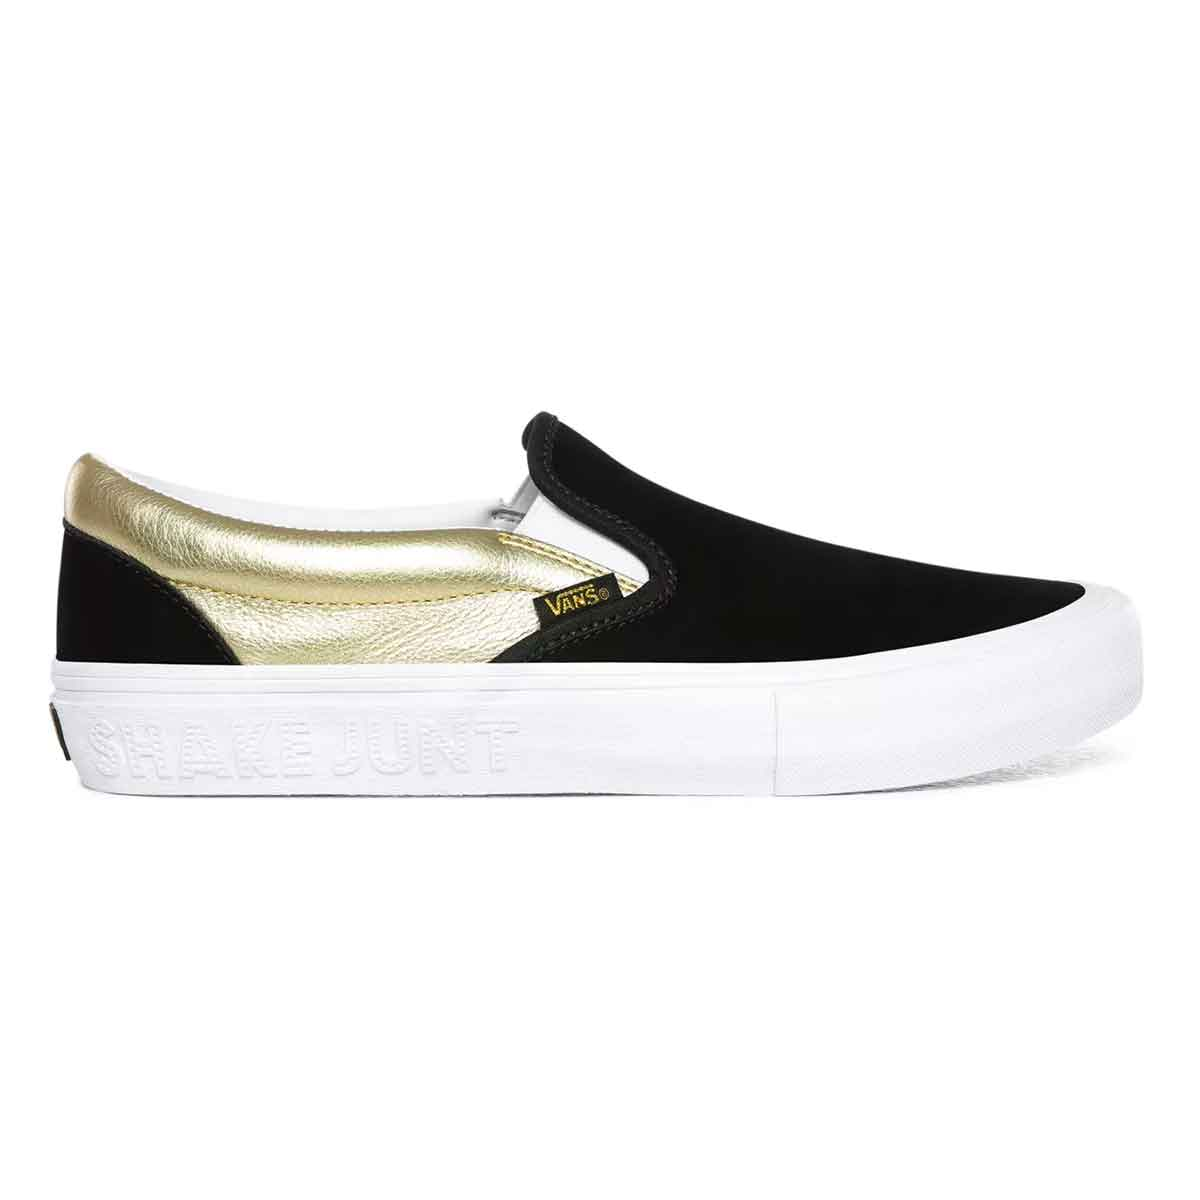 Vans X Shake Junt Slip On Pro Shoes